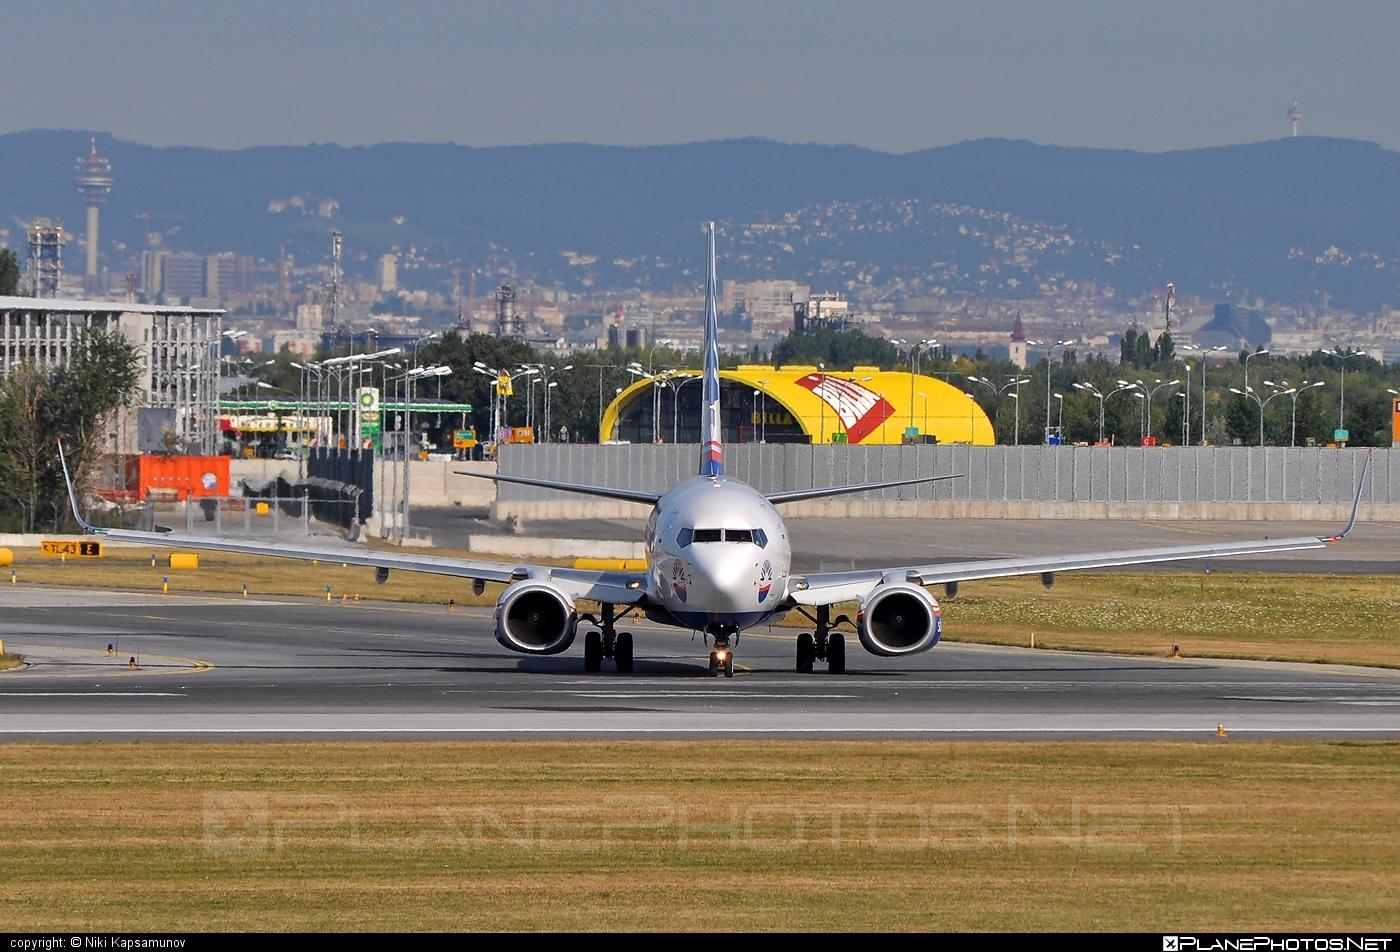 Boeing 737-800 - TC-SNL operated by SunExpress #b737 #b737nextgen #b737ng #boeing #boeing737 #sunexpress